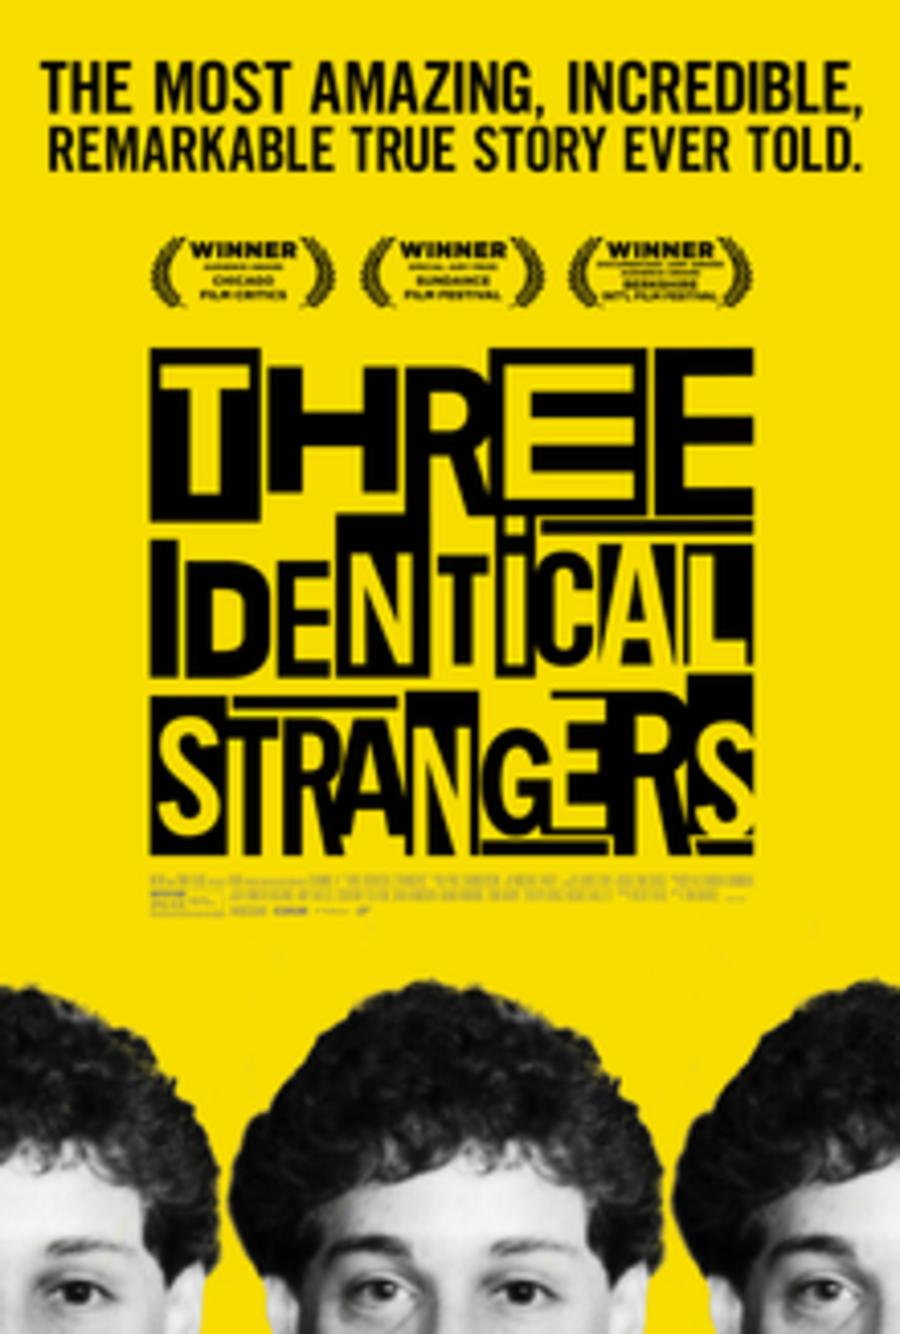 Three Identical Camerons